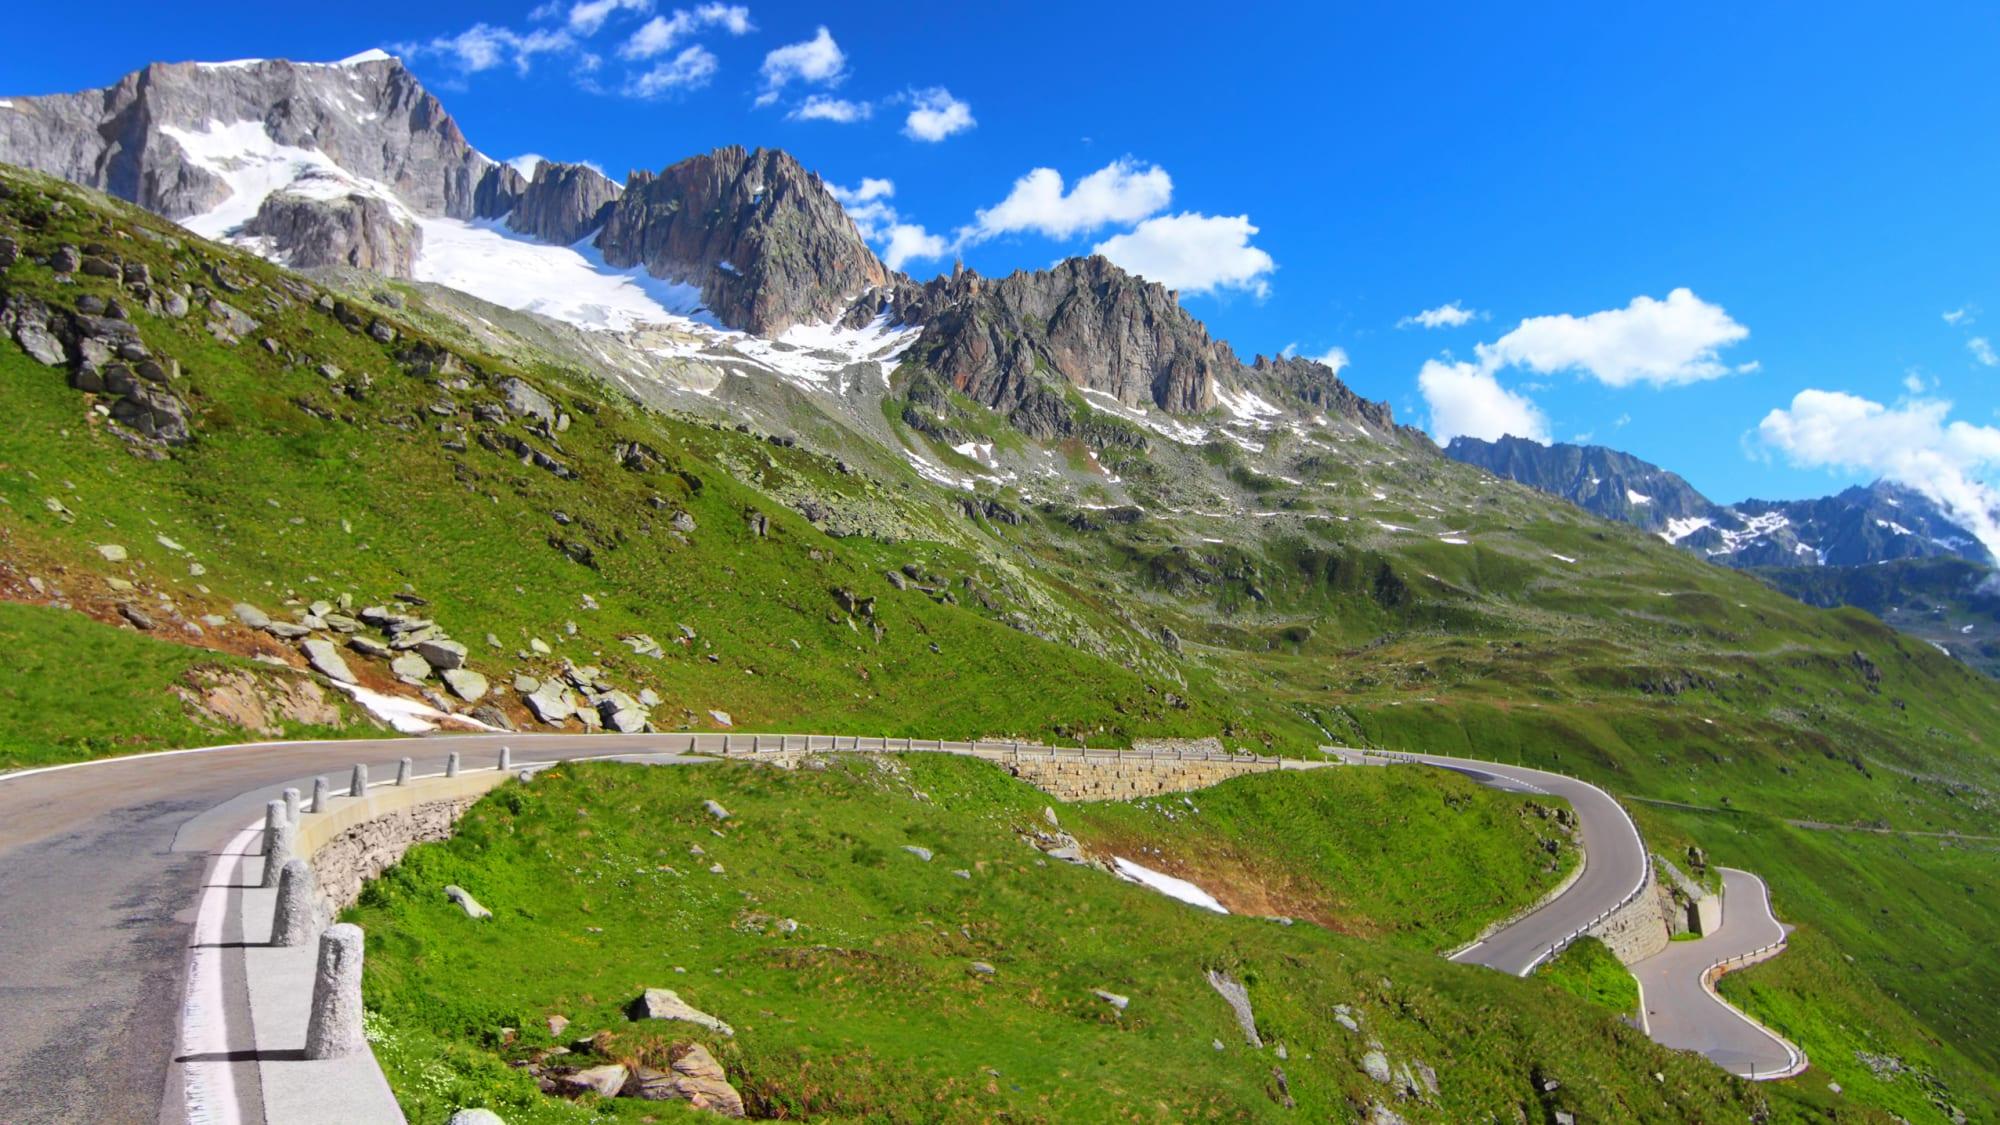 Furkapass Alpenstraße in den Schweizer Alpen